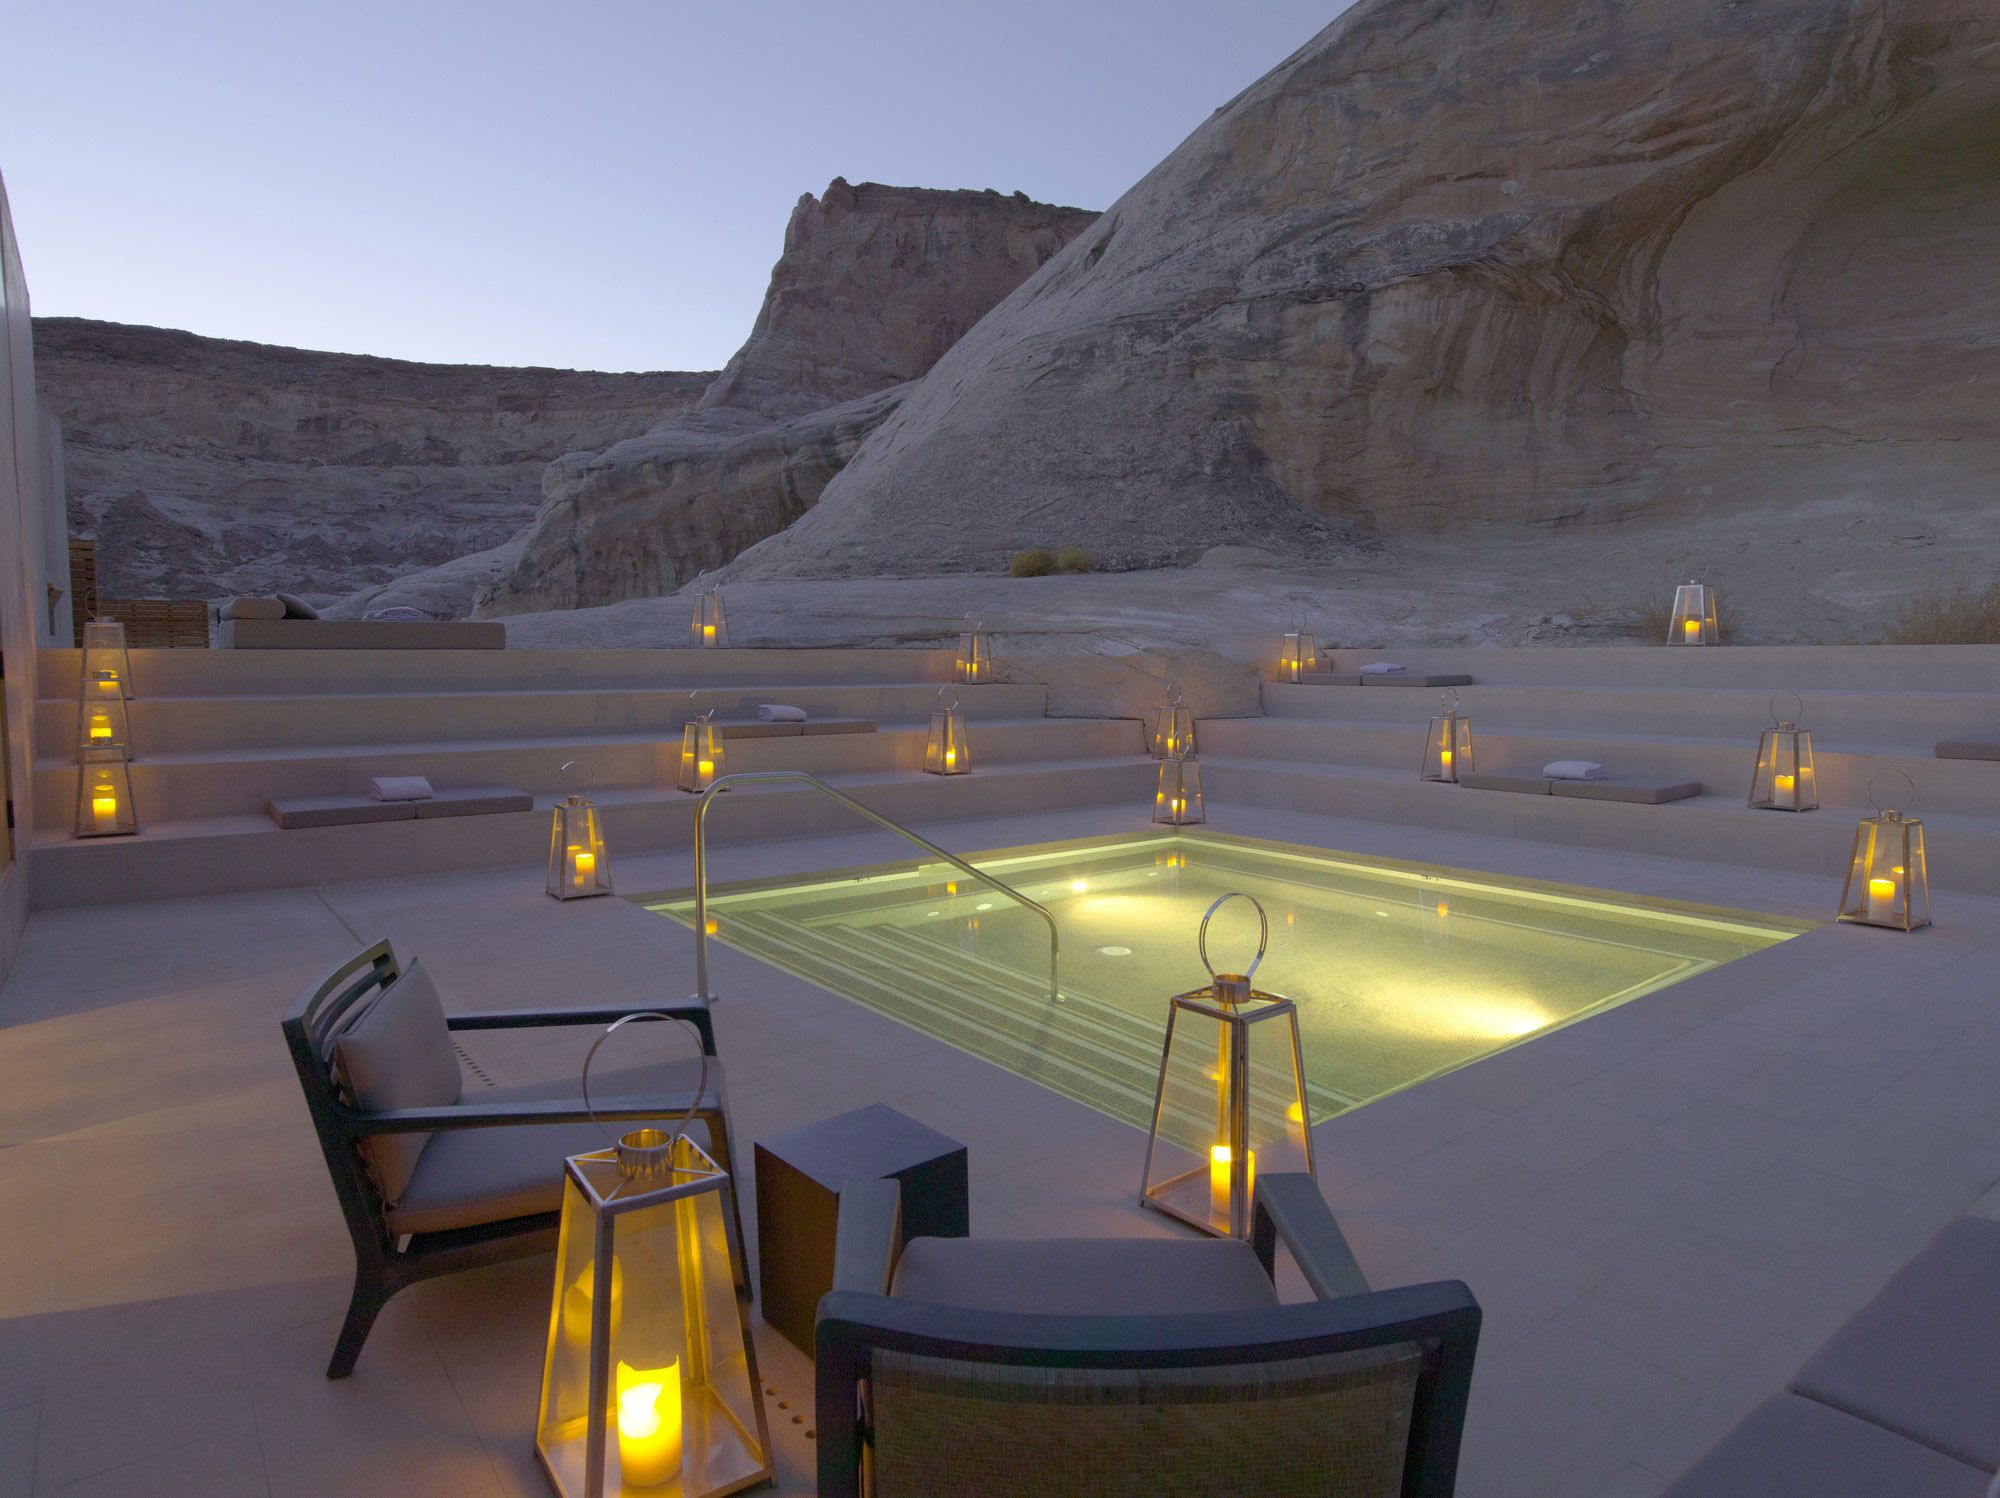 Amangiri-Luxury-Resort-Hotel-in-Canyon-Point-06-1